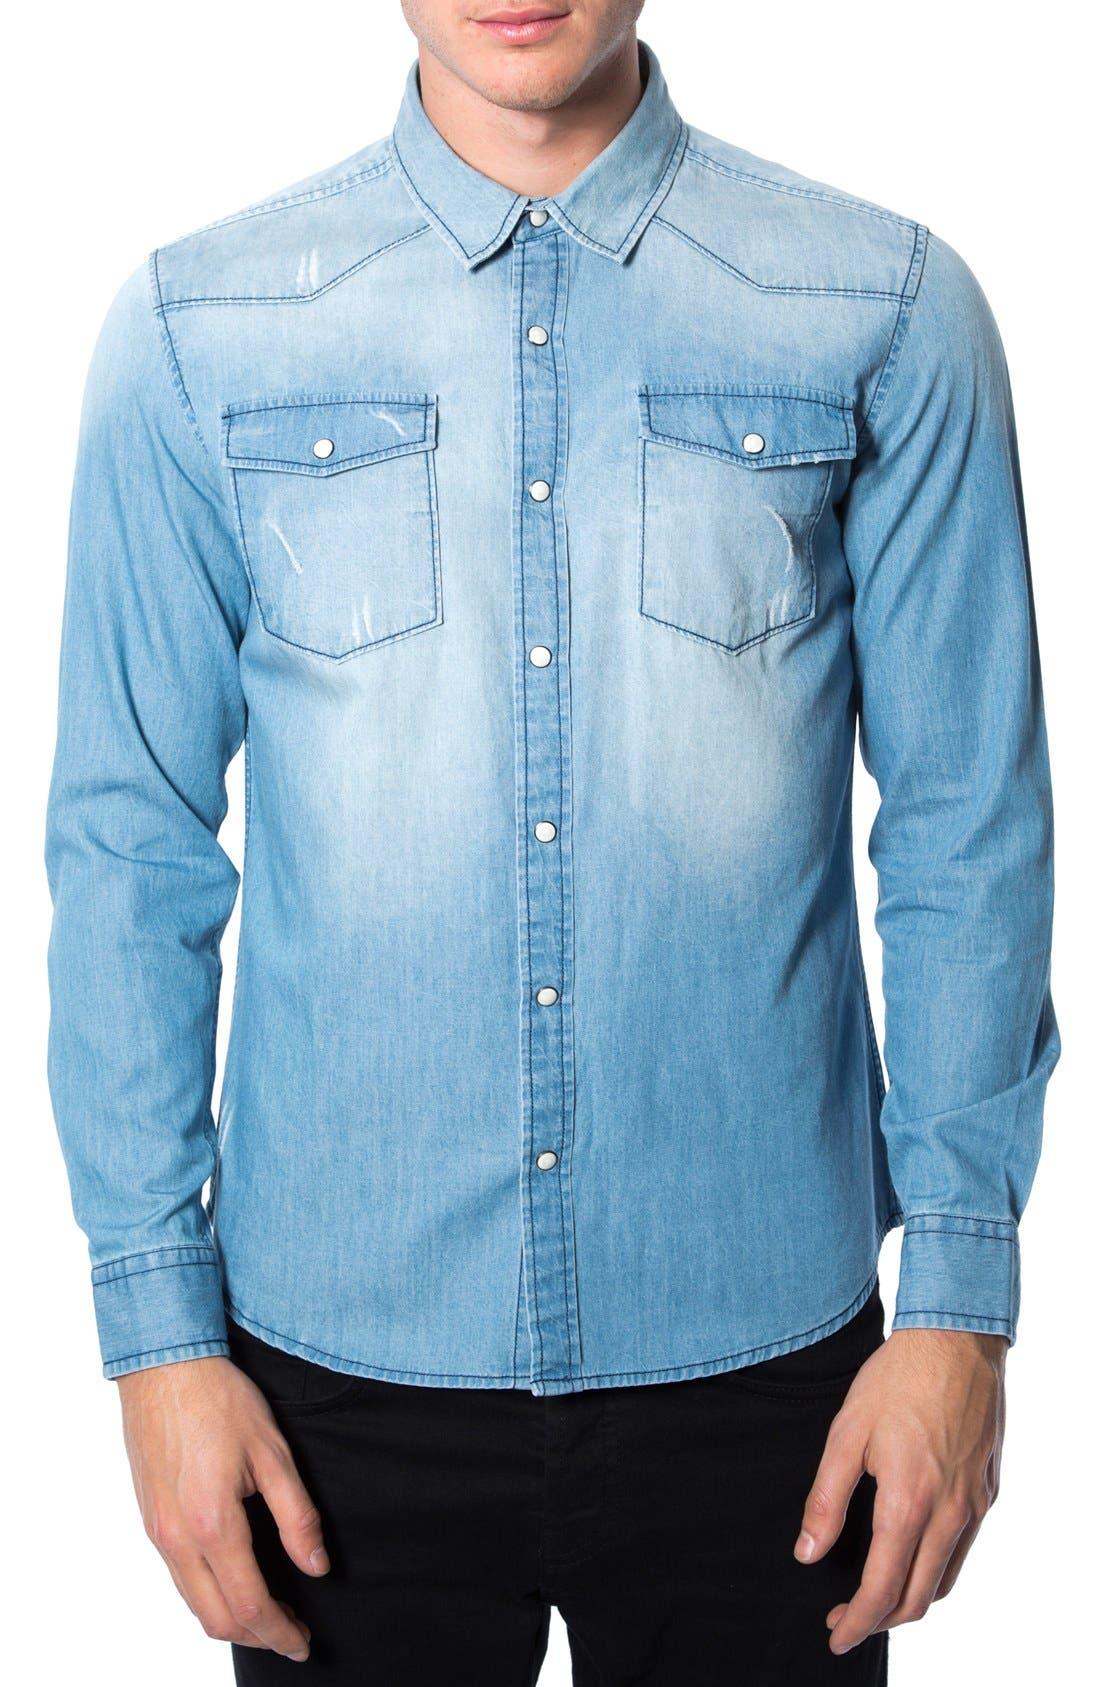 'Beyond Me' Trim Fit Chambray Shirt,                         Main,                         color, Blue